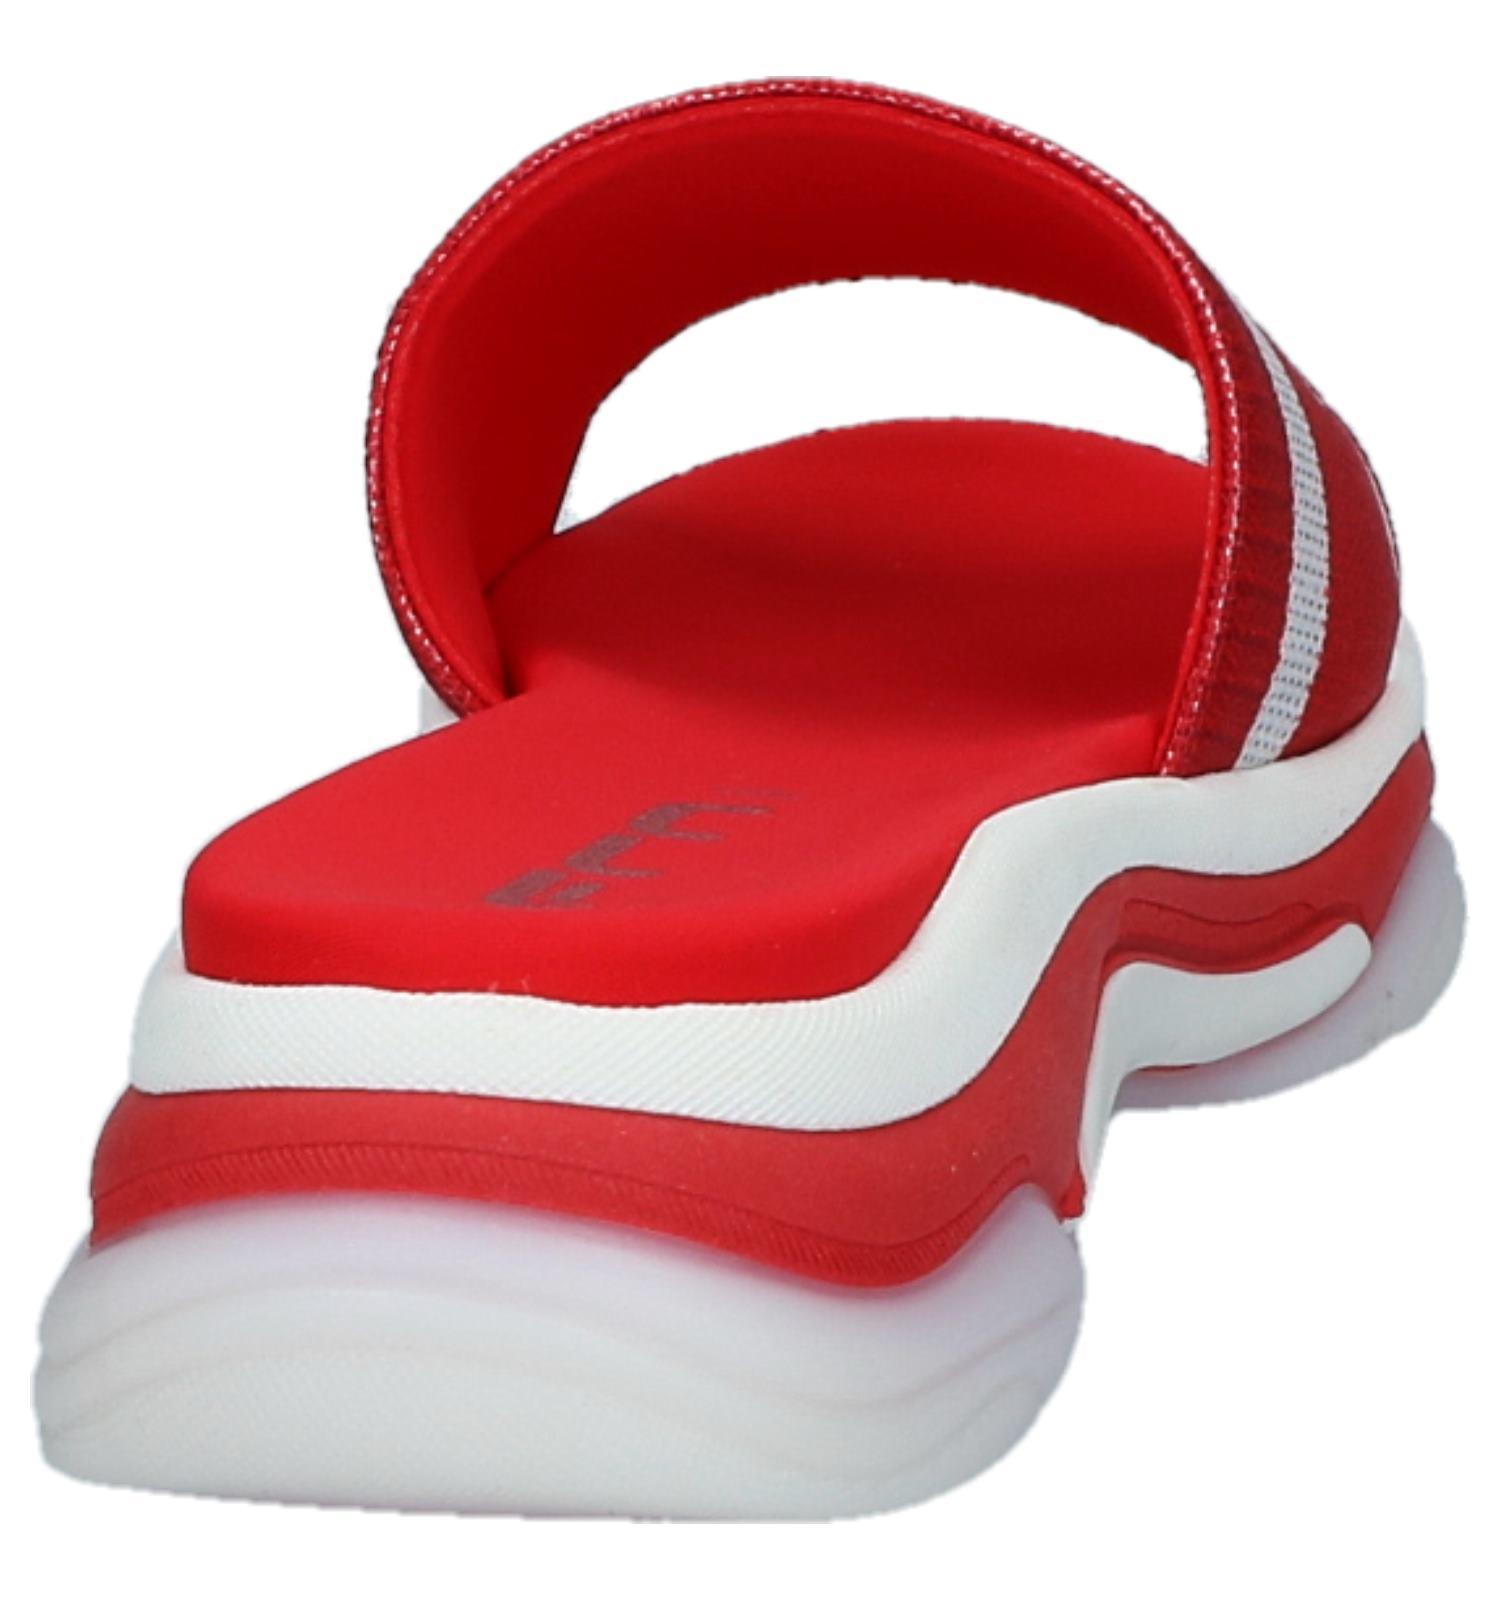 10 Rode Super 10 Fornarina Rode Slippers Slippers Fornarina Fornarina Super xoCeBd